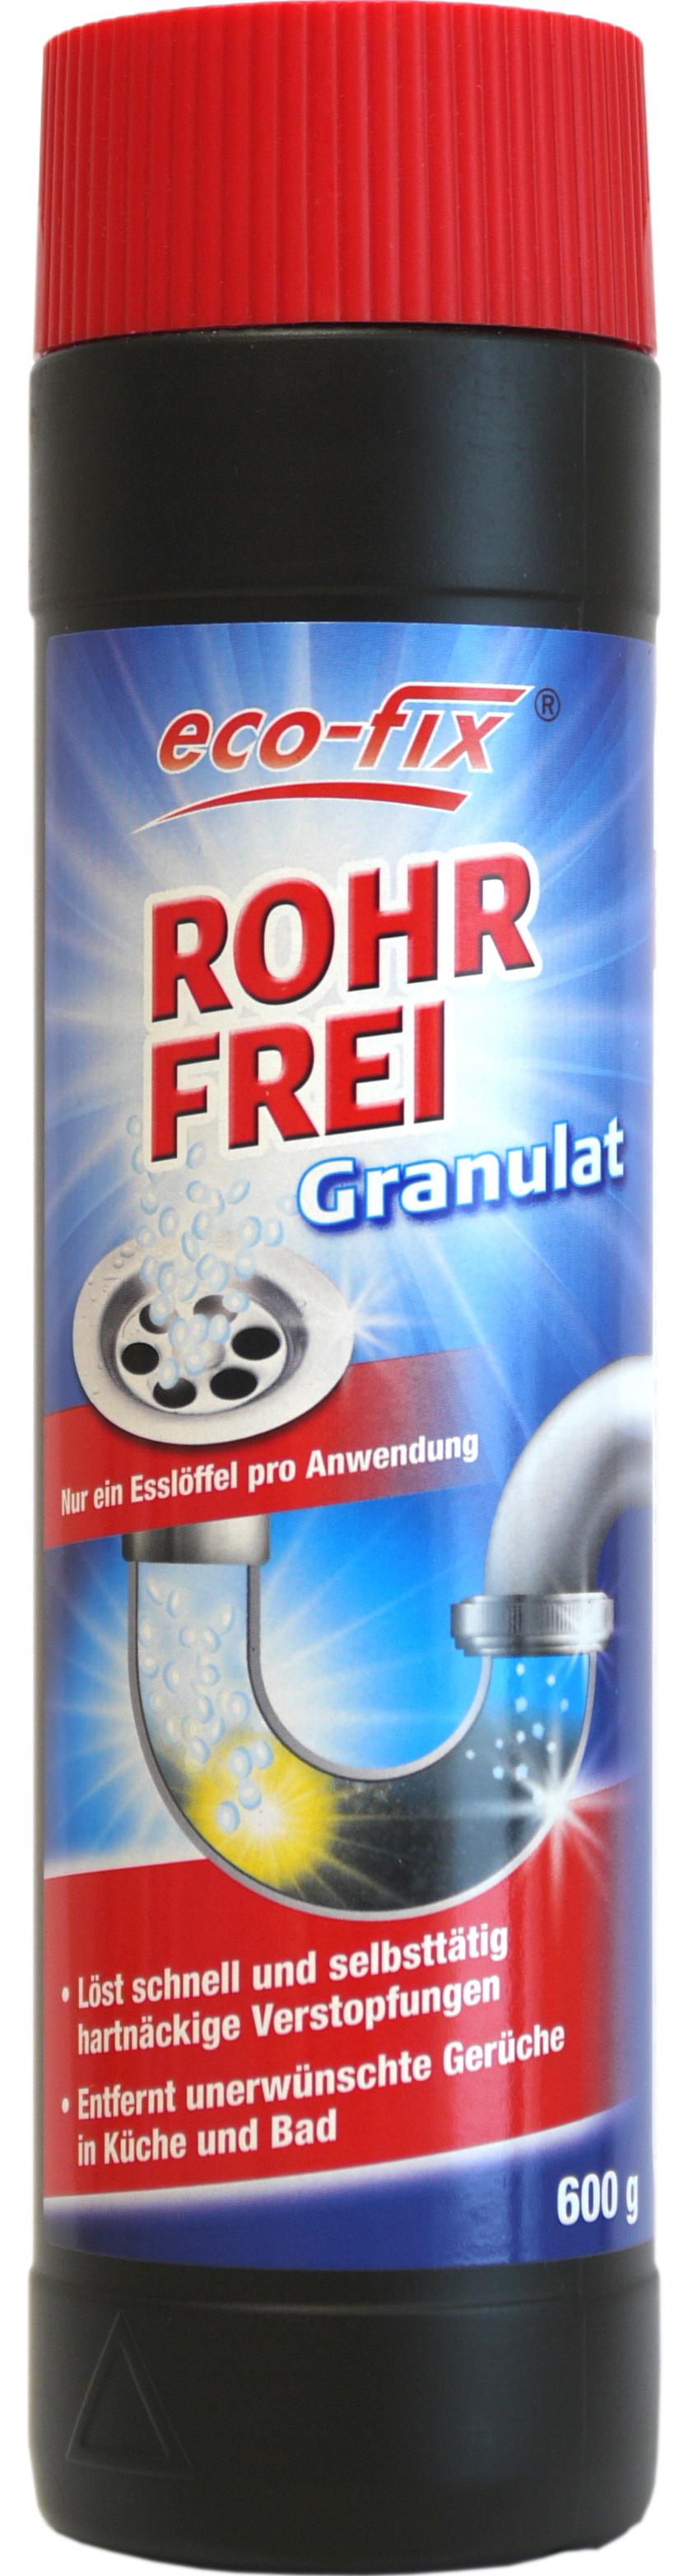 00726 - eco-fix  Rohrfrei Granulat 600 g